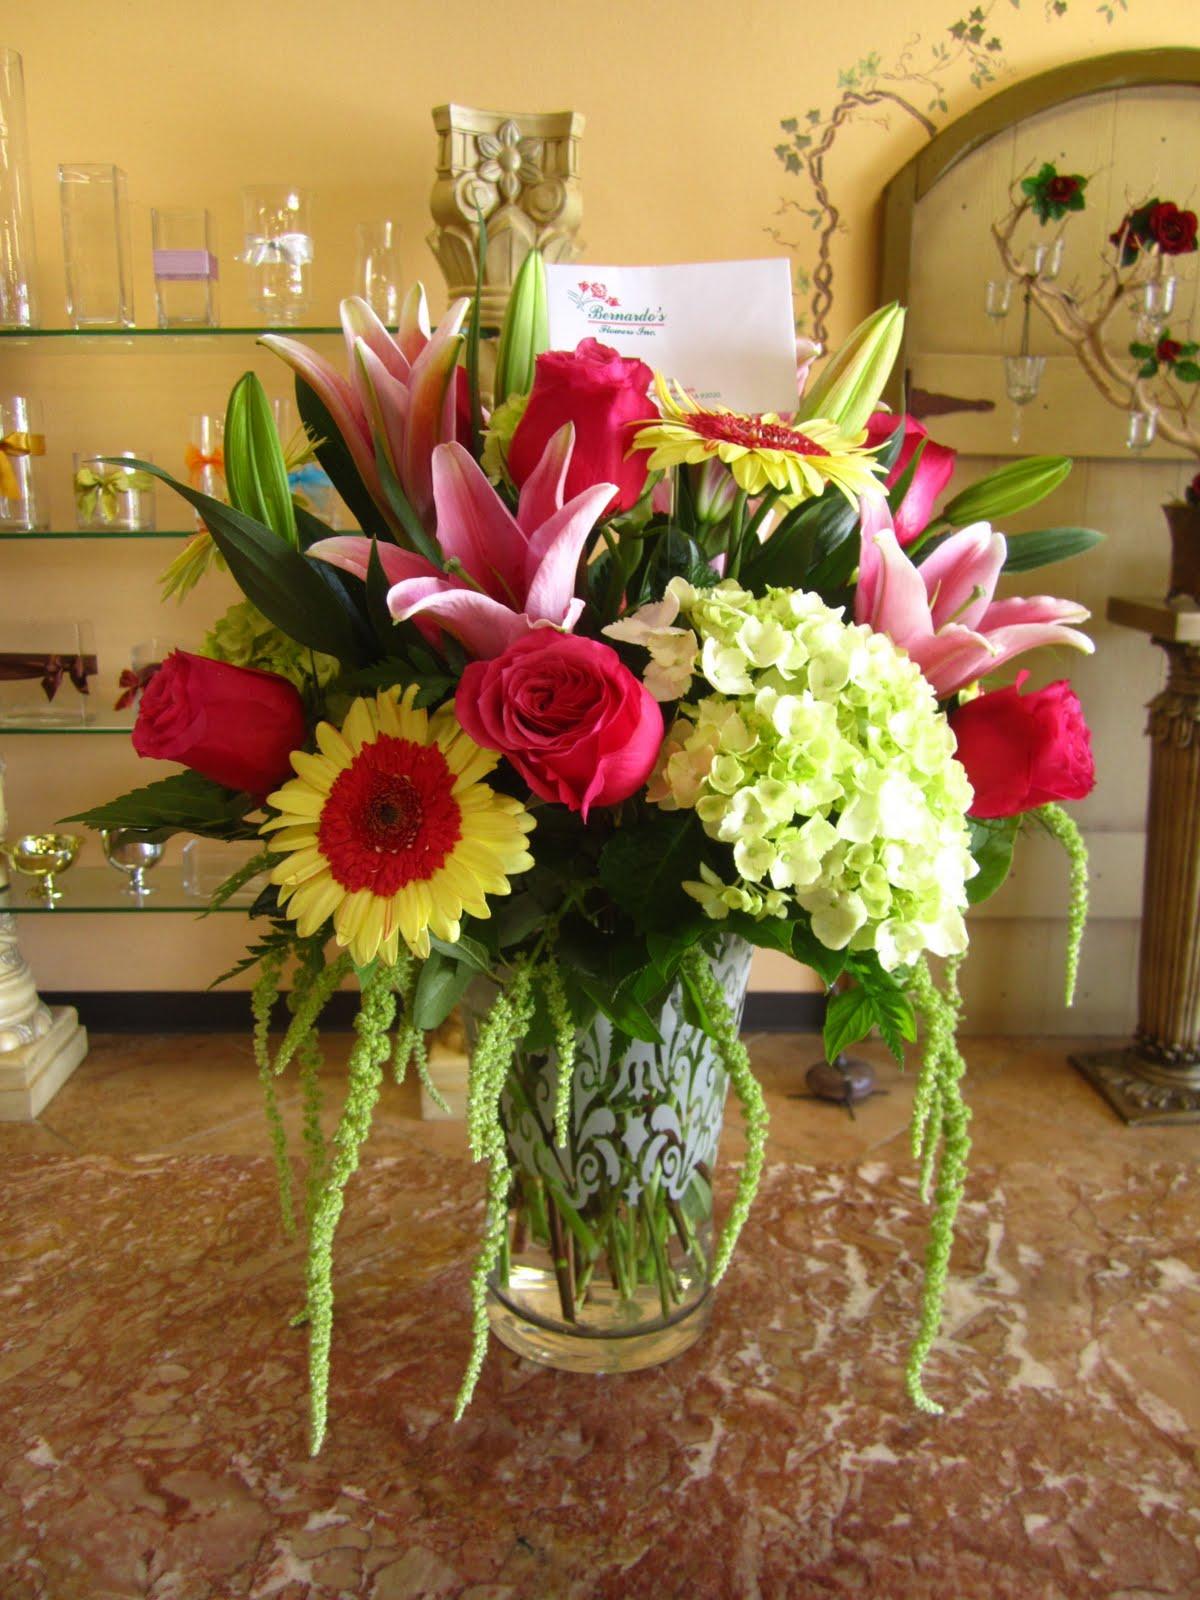 Bernardos flowers flower vase arrangement flower vase arrangement reviewsmspy